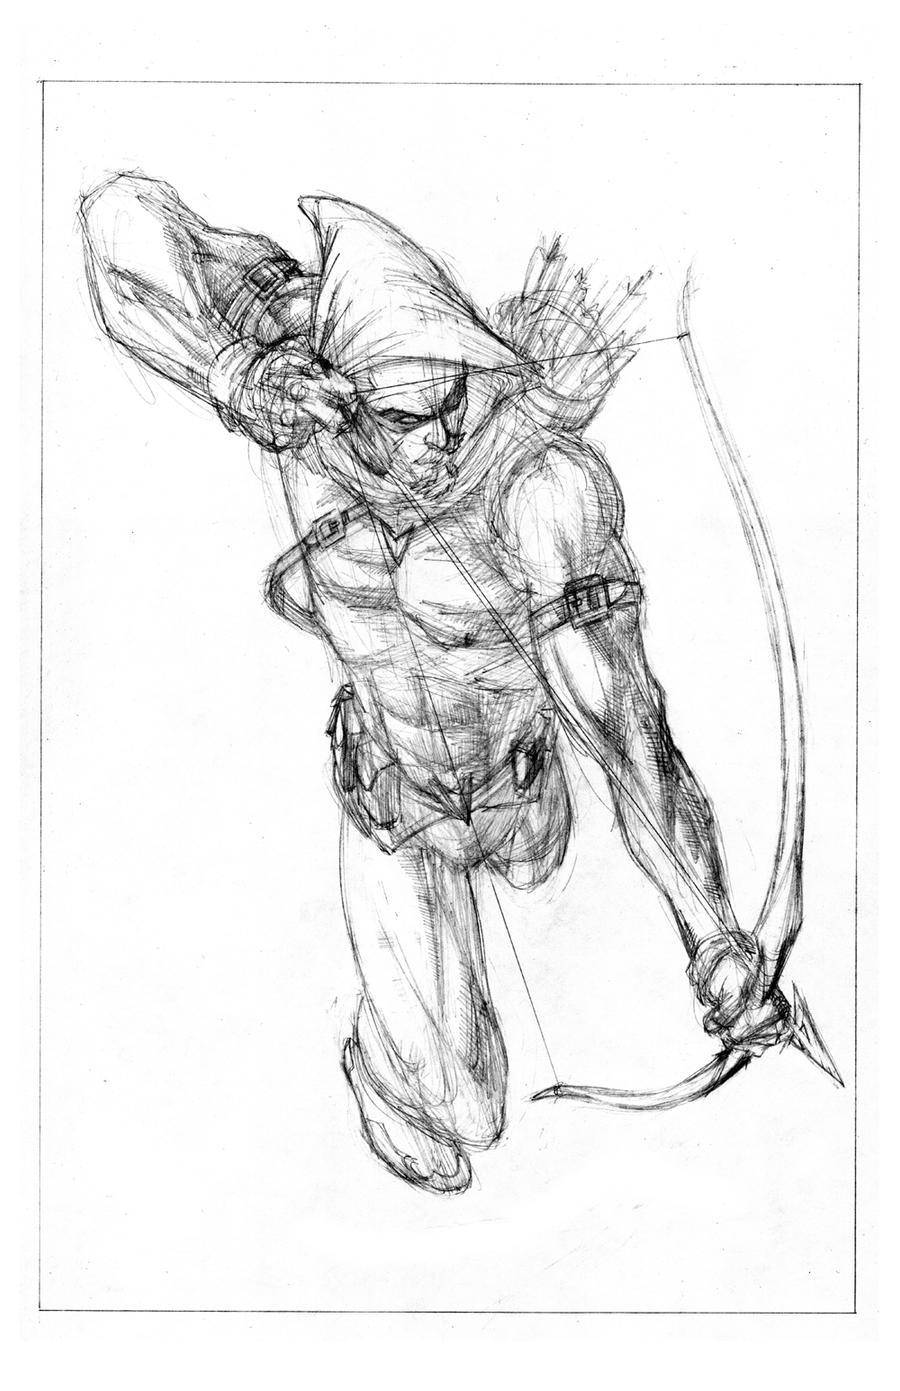 green arrow sketch by jamesq on deviantart